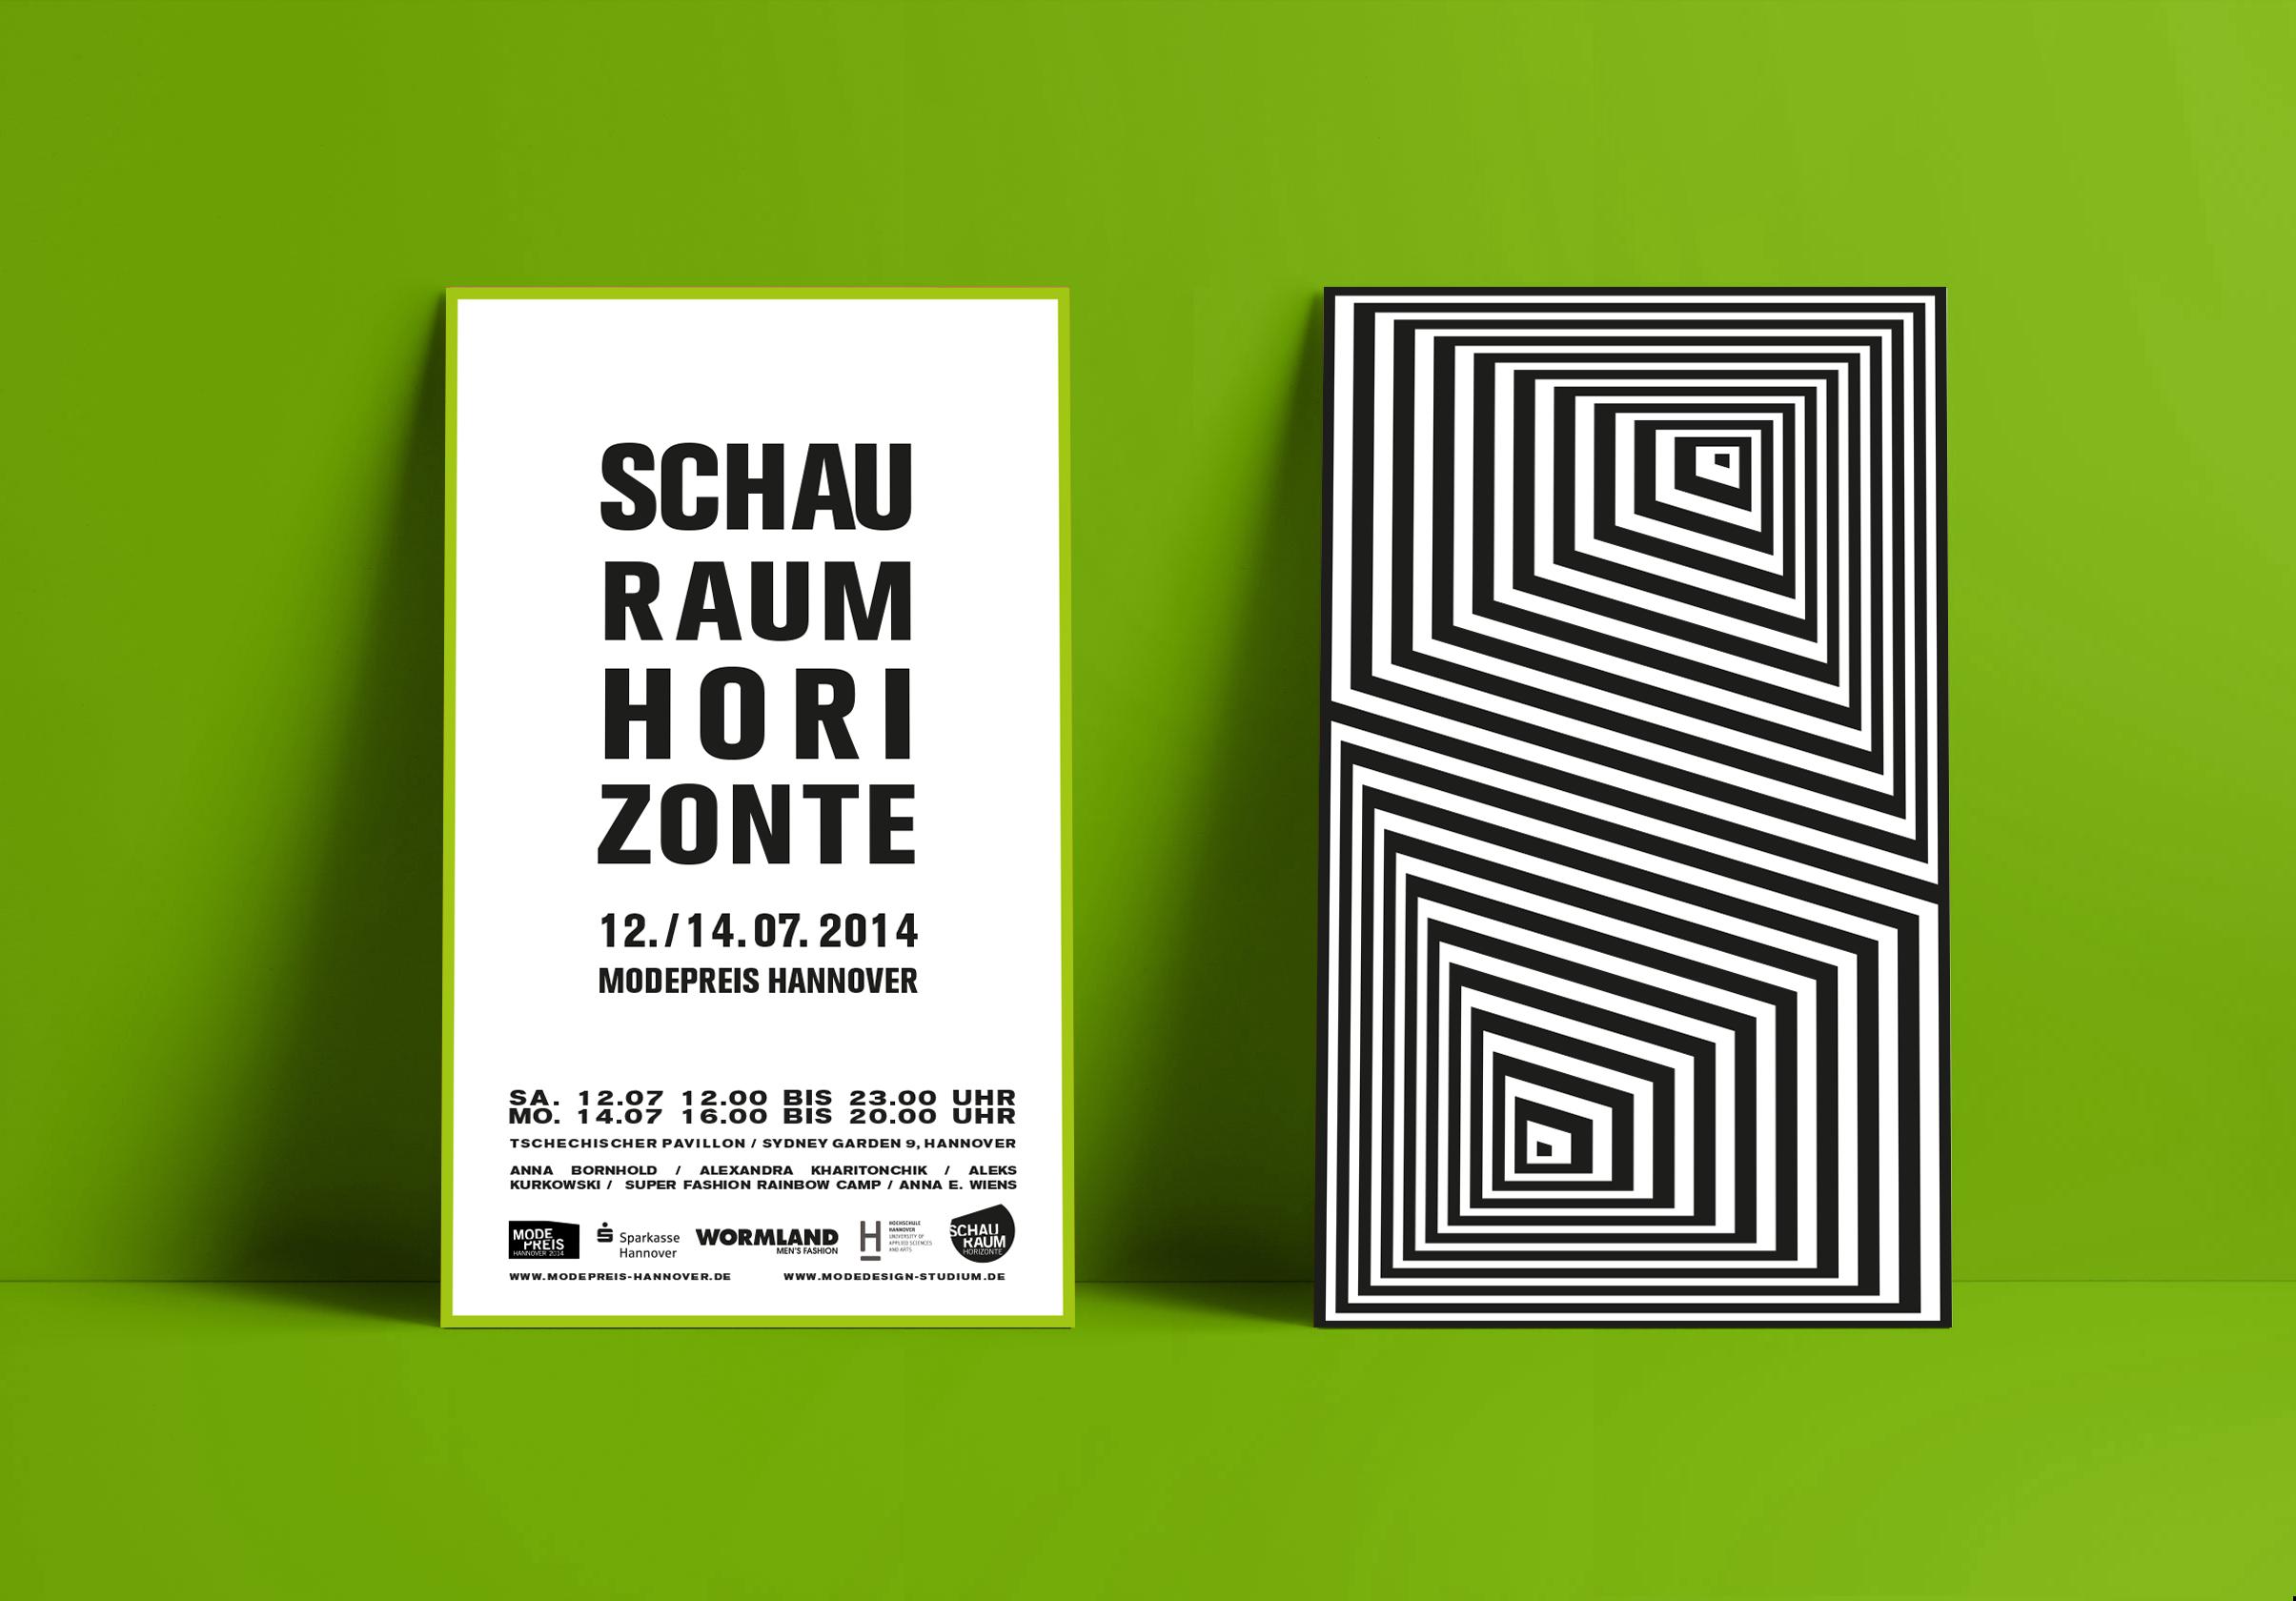 Corporate Design, Brandig, Event Design, Modepreis Hannover Plakat | Freelancer Grafik Design Berlin